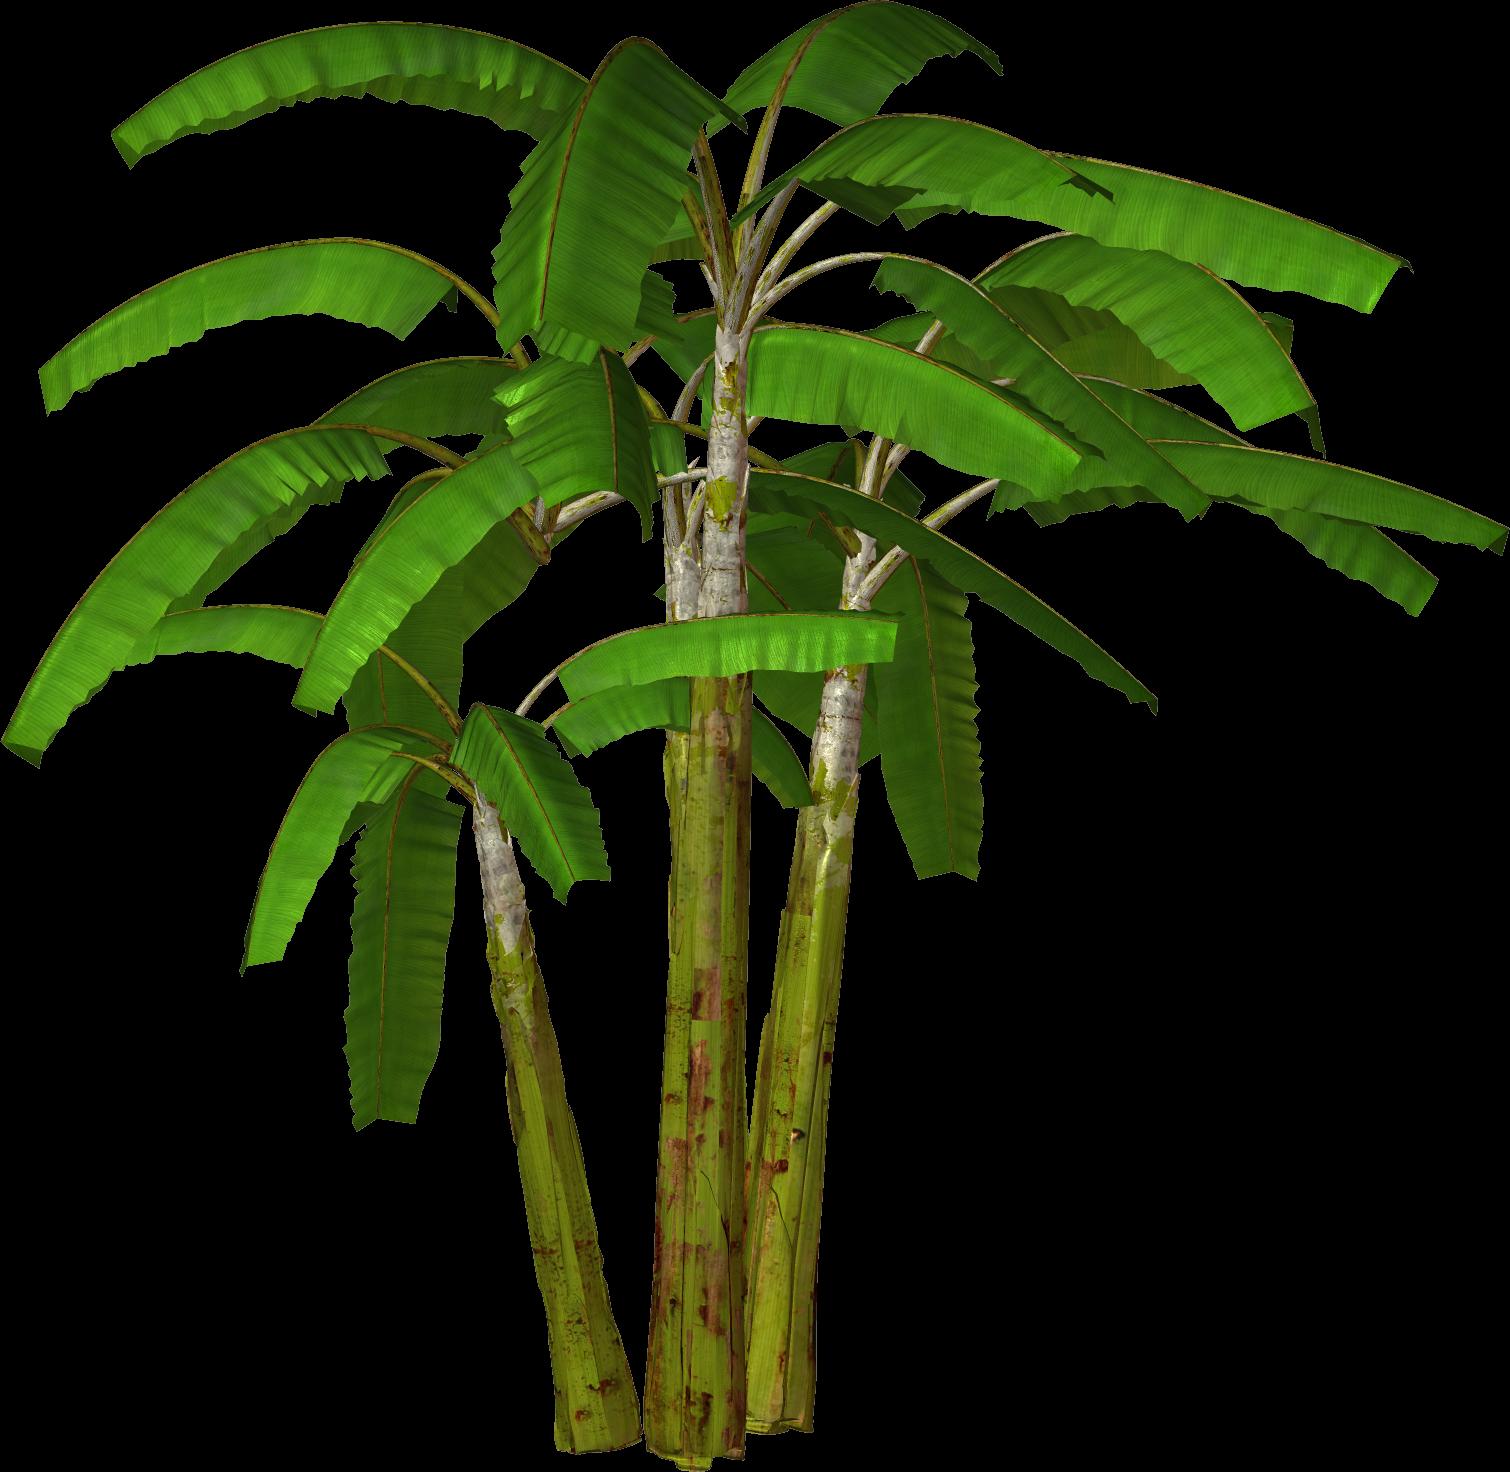 Clip Art Palm Trees - Cliparts.co